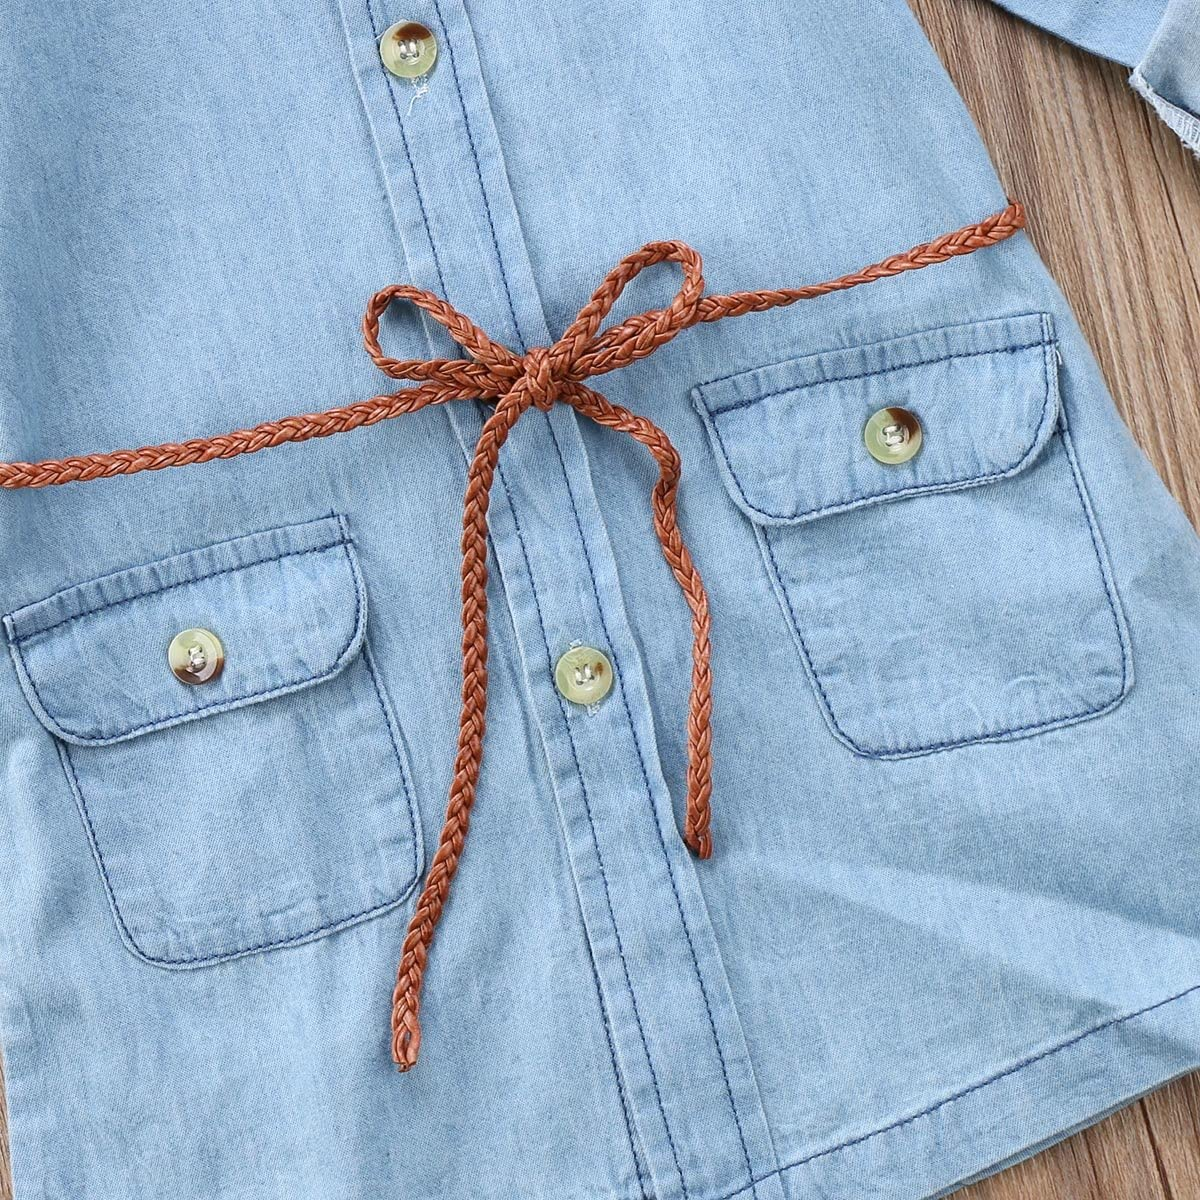 BiggerStore Fashion Kids Toddler Baby Girl Half/Long Sleeve Denim Tunic Jean Shirt Dress with Belt for Girl 1-5T